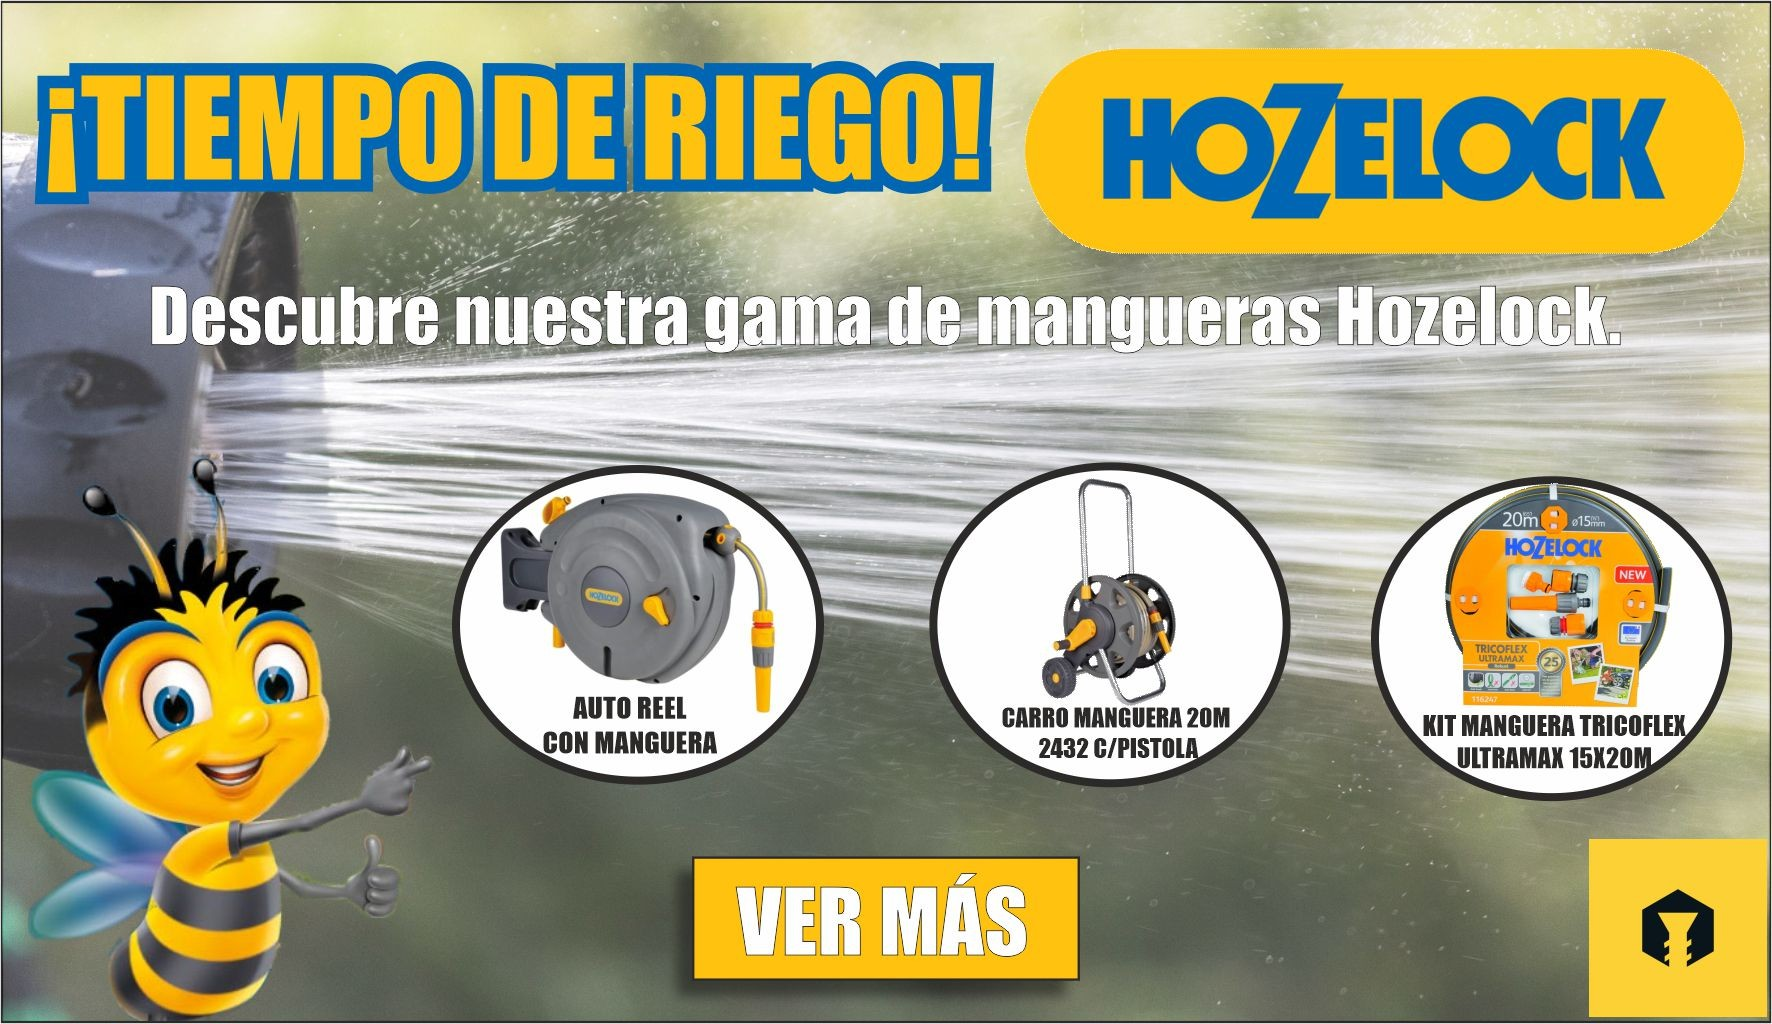 PULSA PARA DESCUBRIR EL CATALOGO DE HOZELOCK